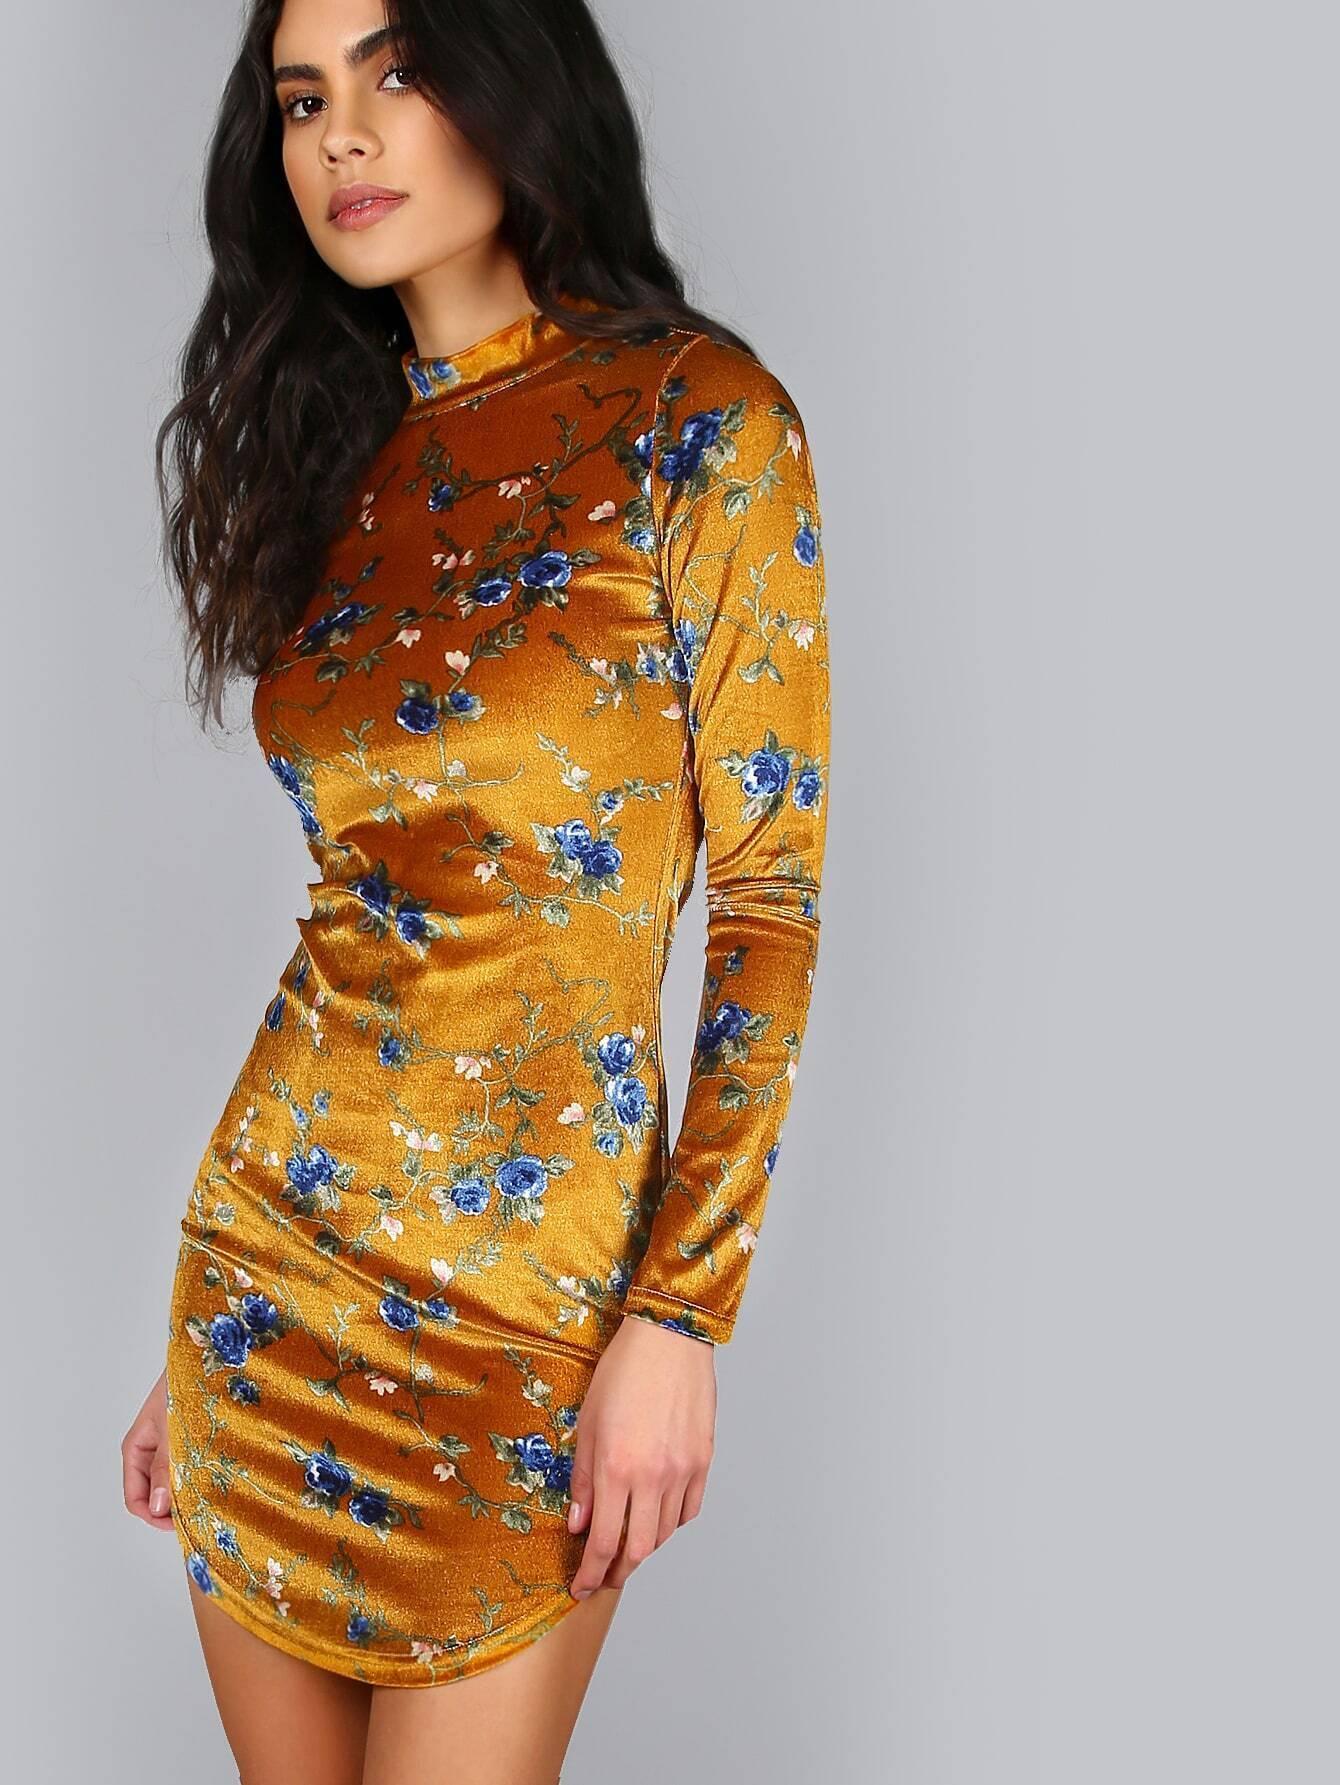 3001ee1d82a755 Apricot Floral Print Mock Neck Long Sleeve Bodycon Dress EmmaCloth ...